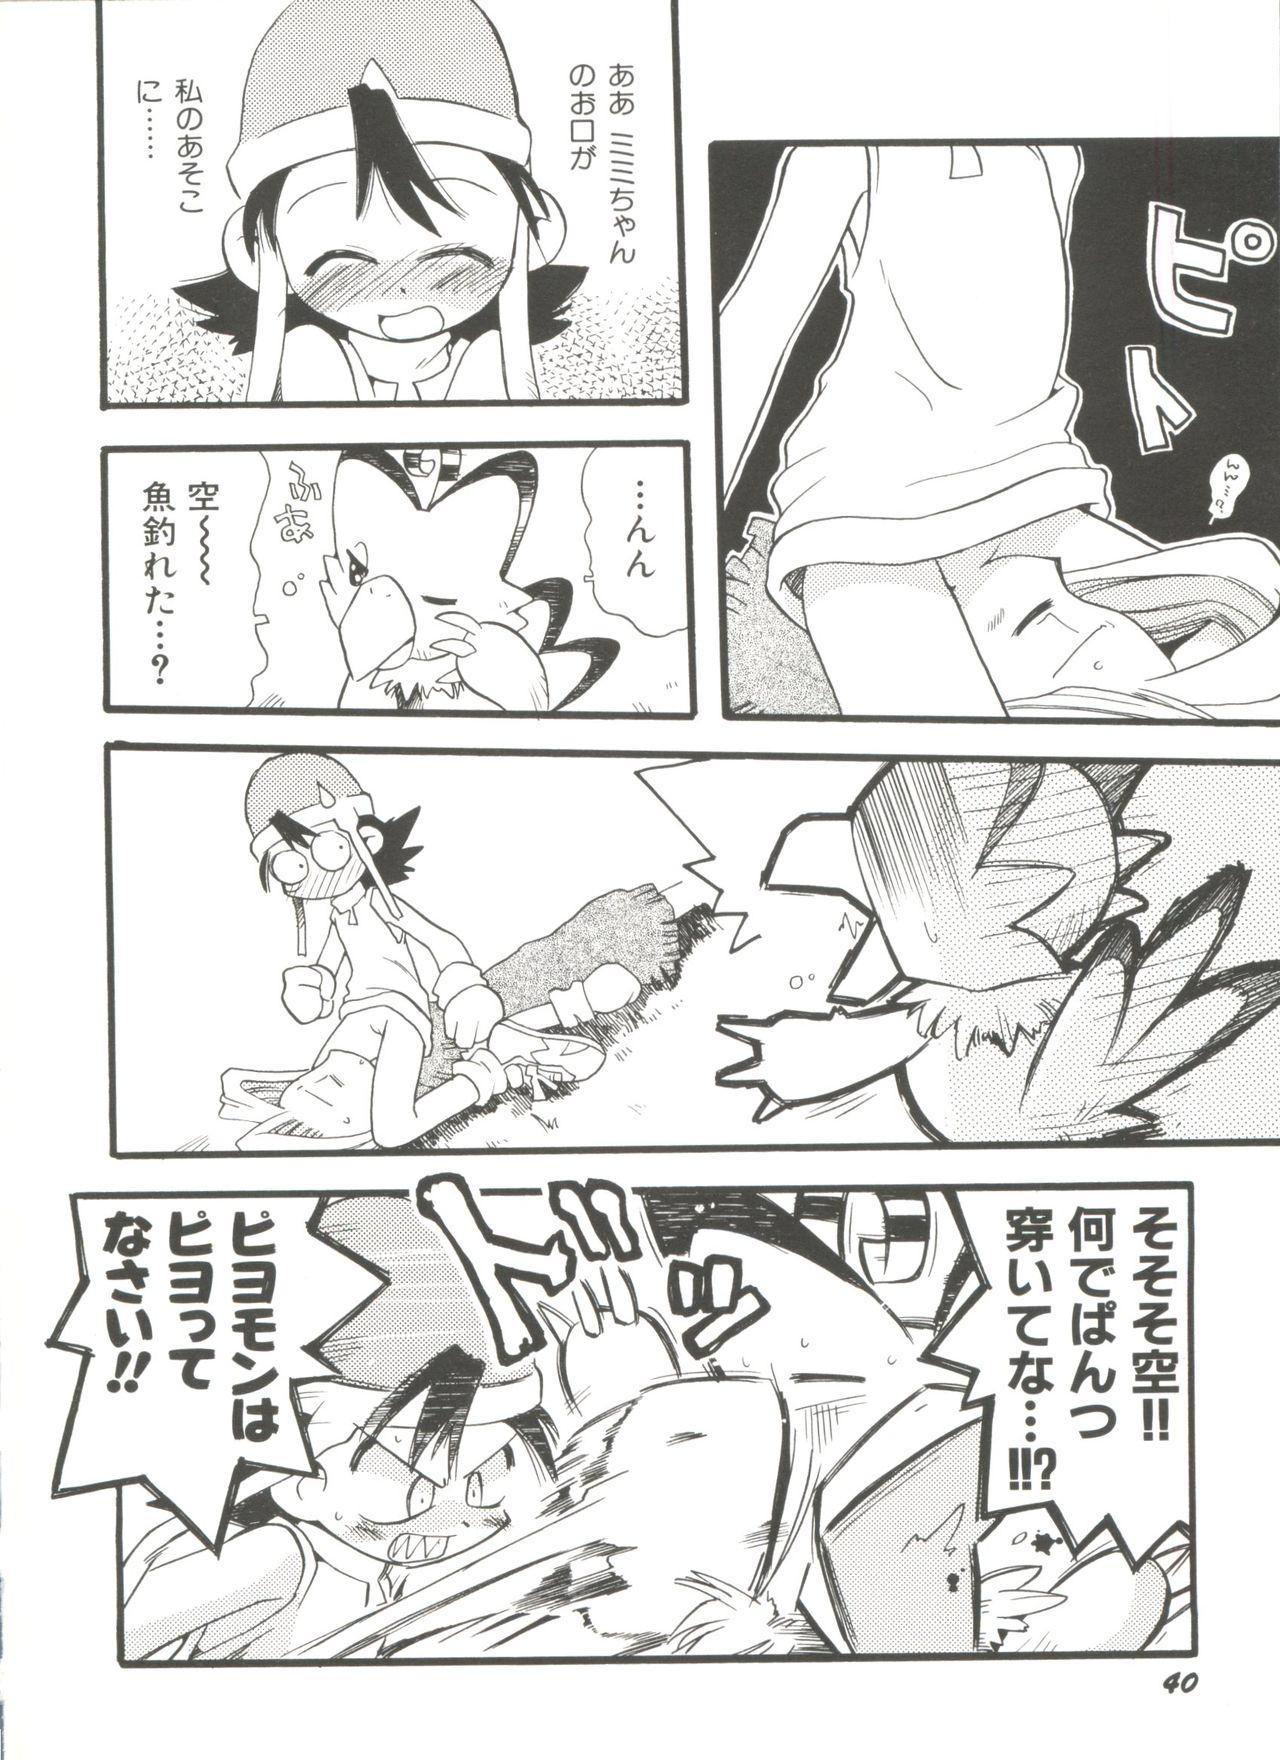 [Anthology] Denei Tamatebako 8 - Utakata no Tenshi-tachi II (Various) 41